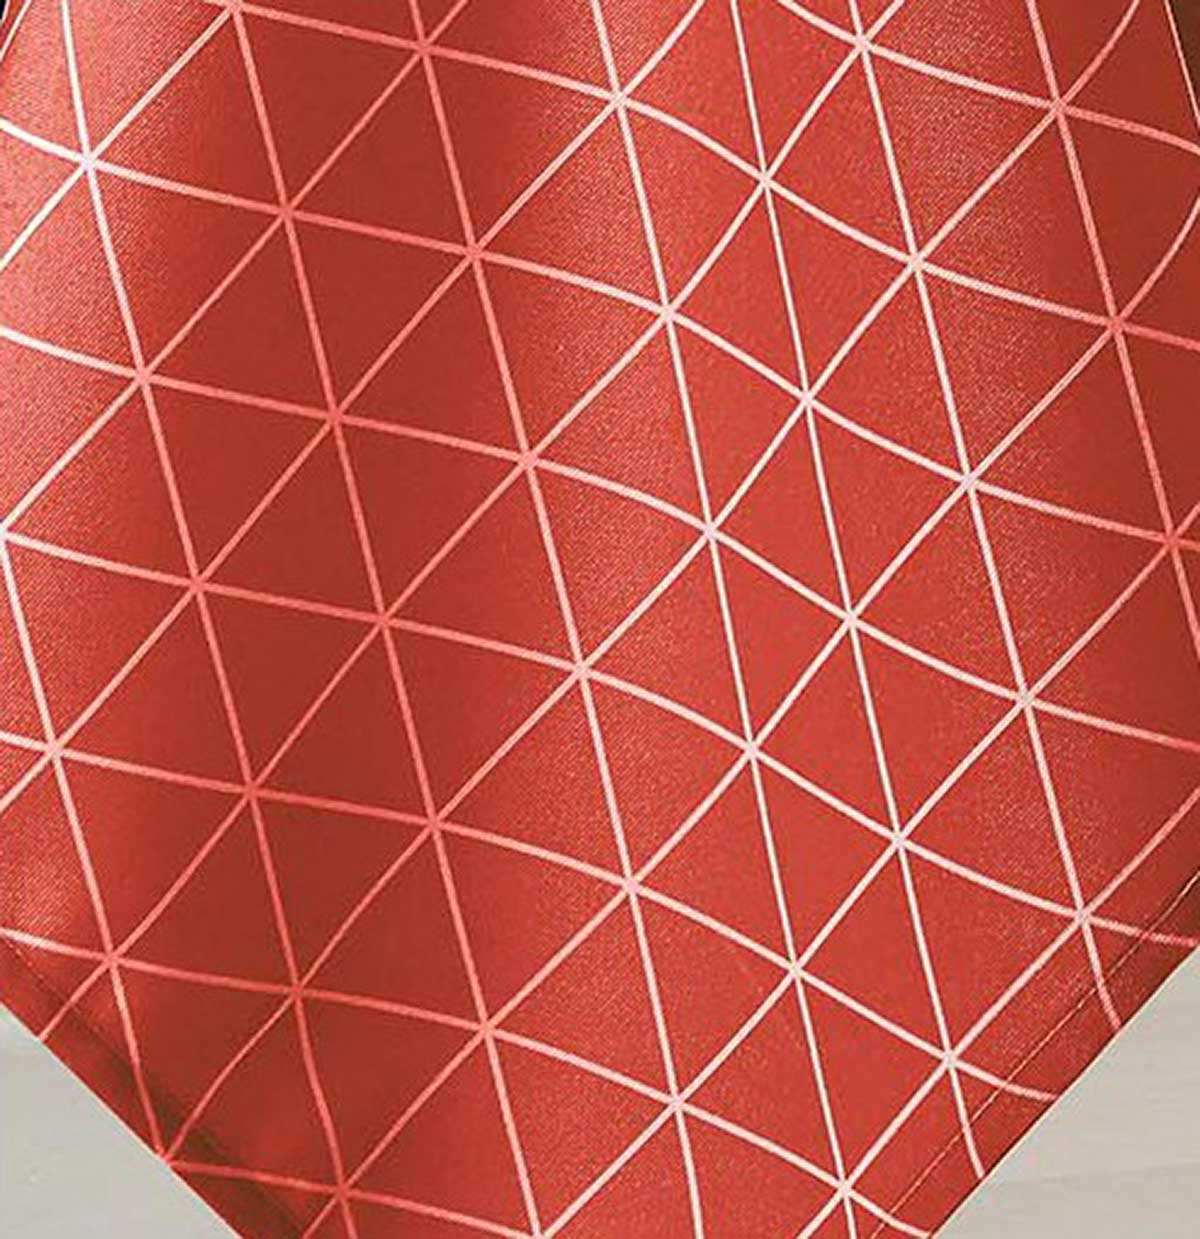 Nappe Ovale Scandinave - Cerise - 180 x 240 cm